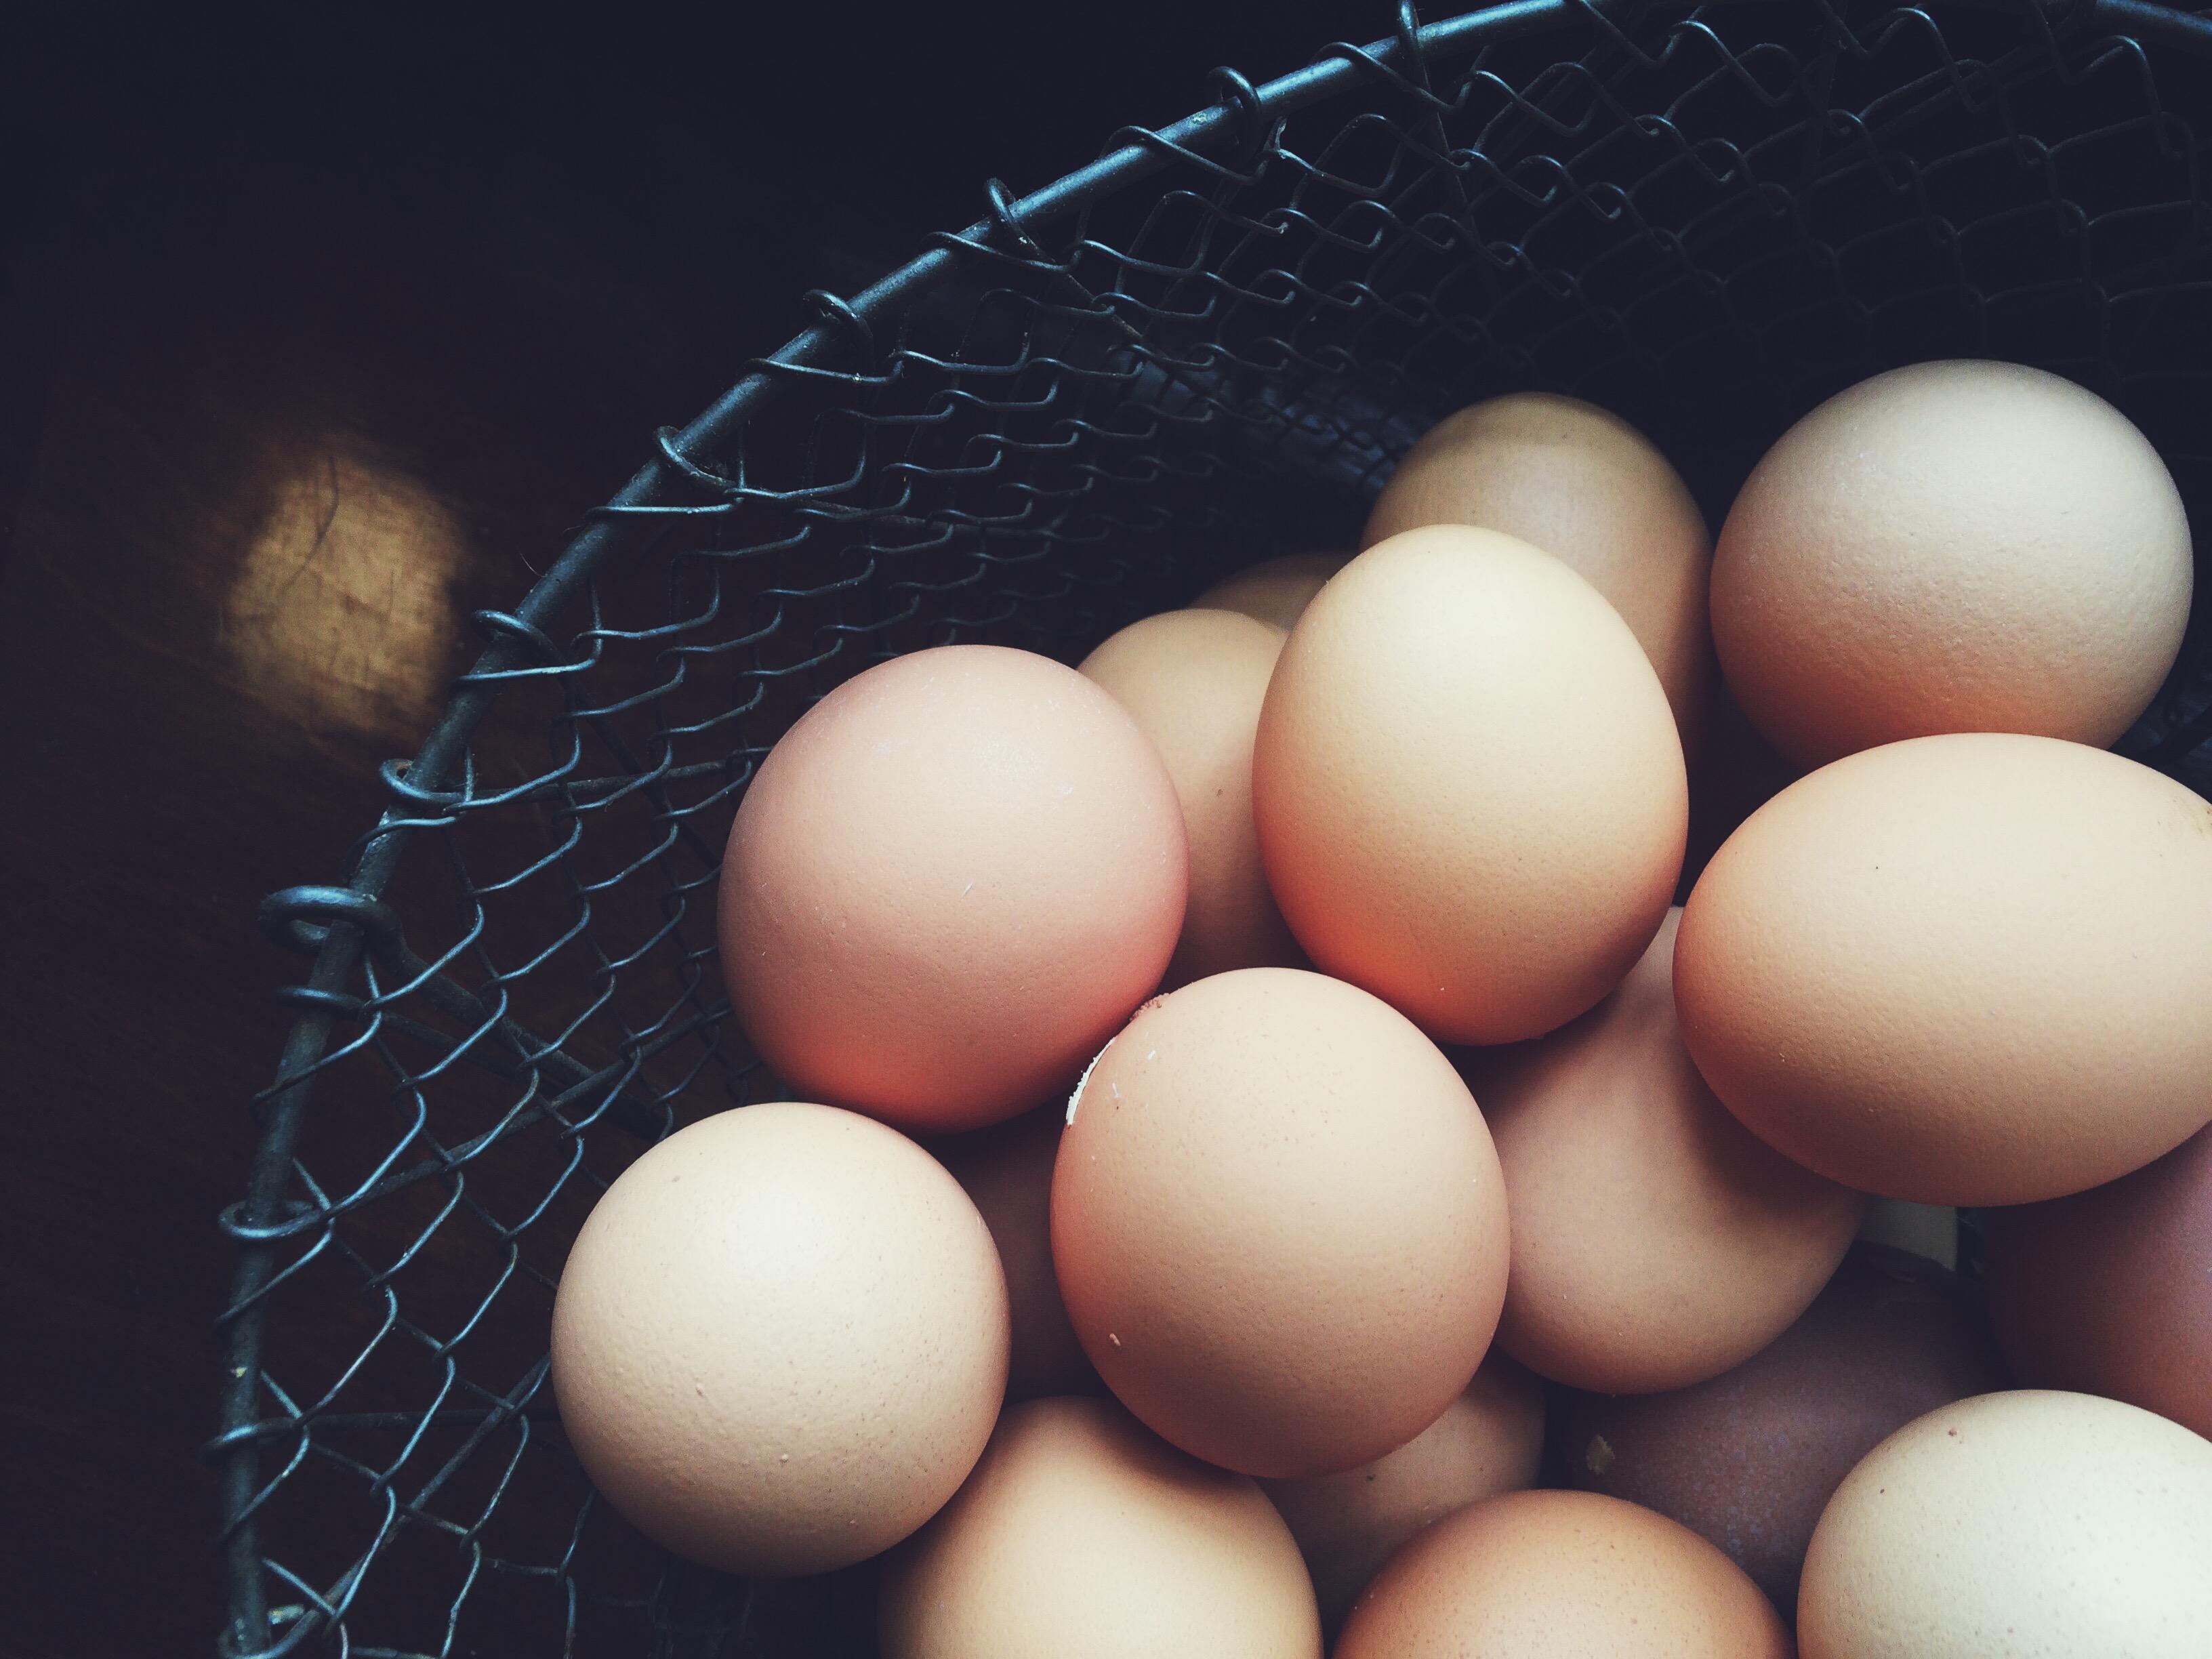 Eggs, April 2016.